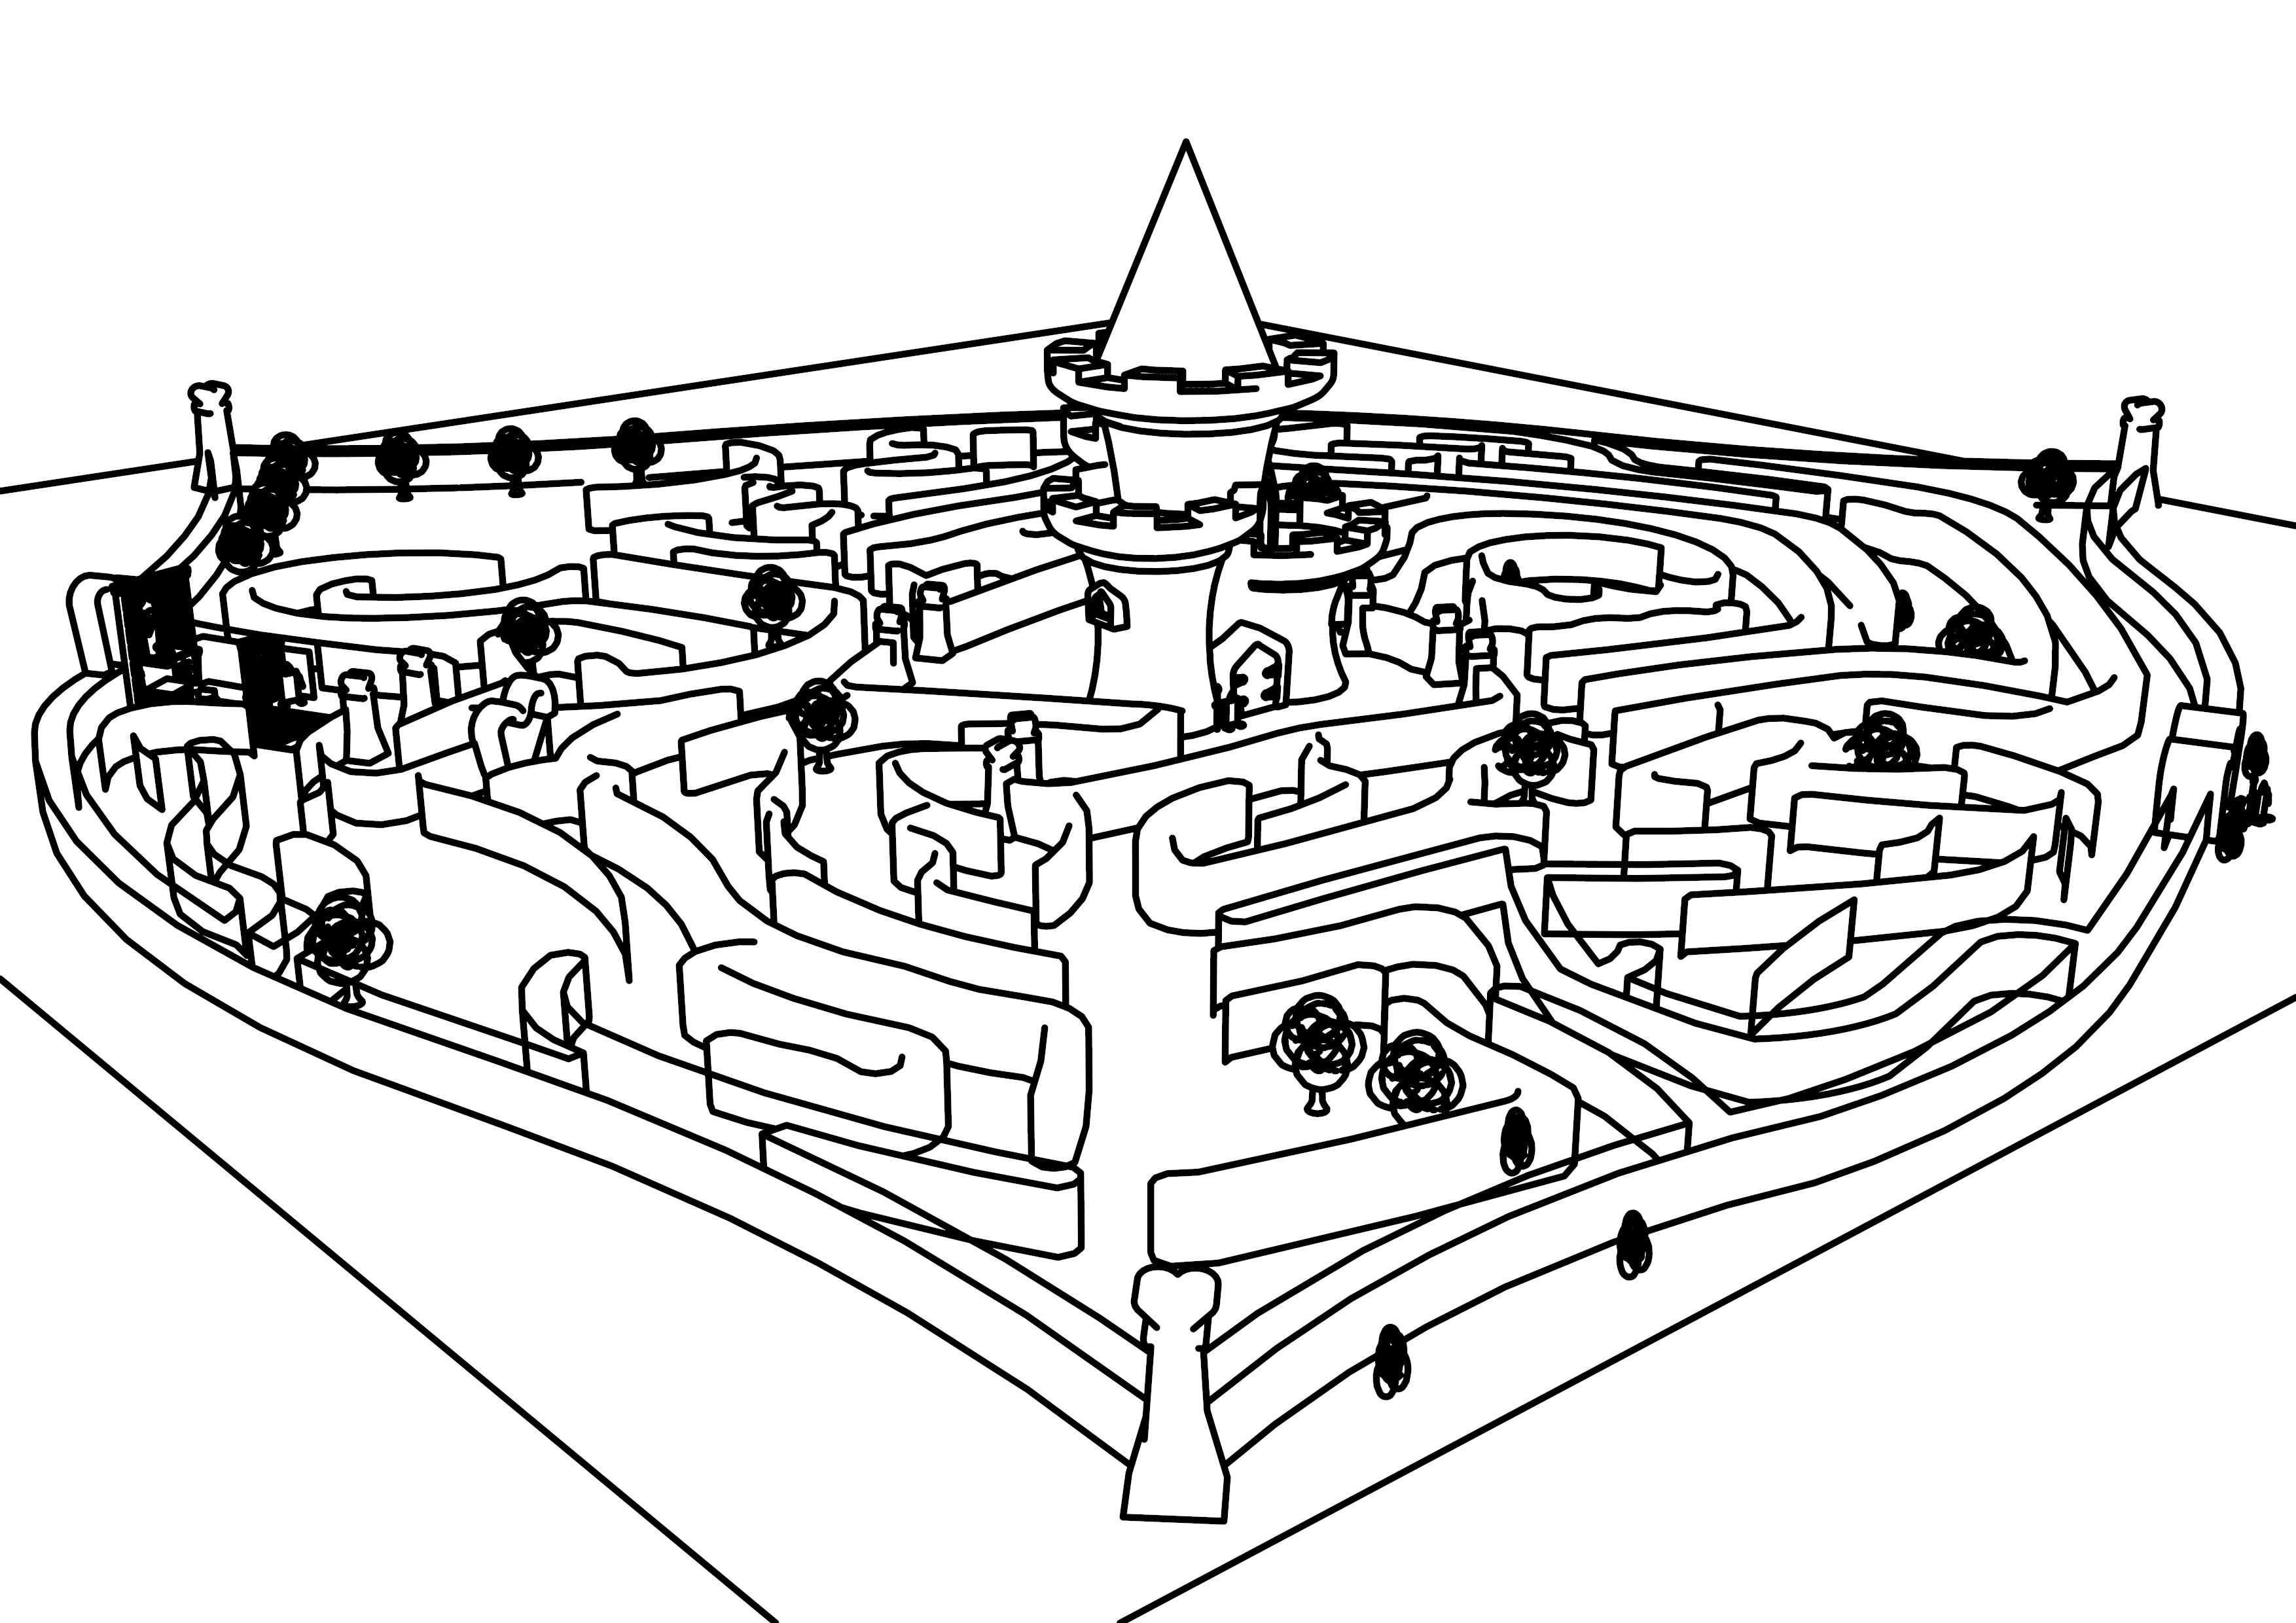 Disney Alice In Wonderland Queen Of Heart Castle And Maze Coloring ...